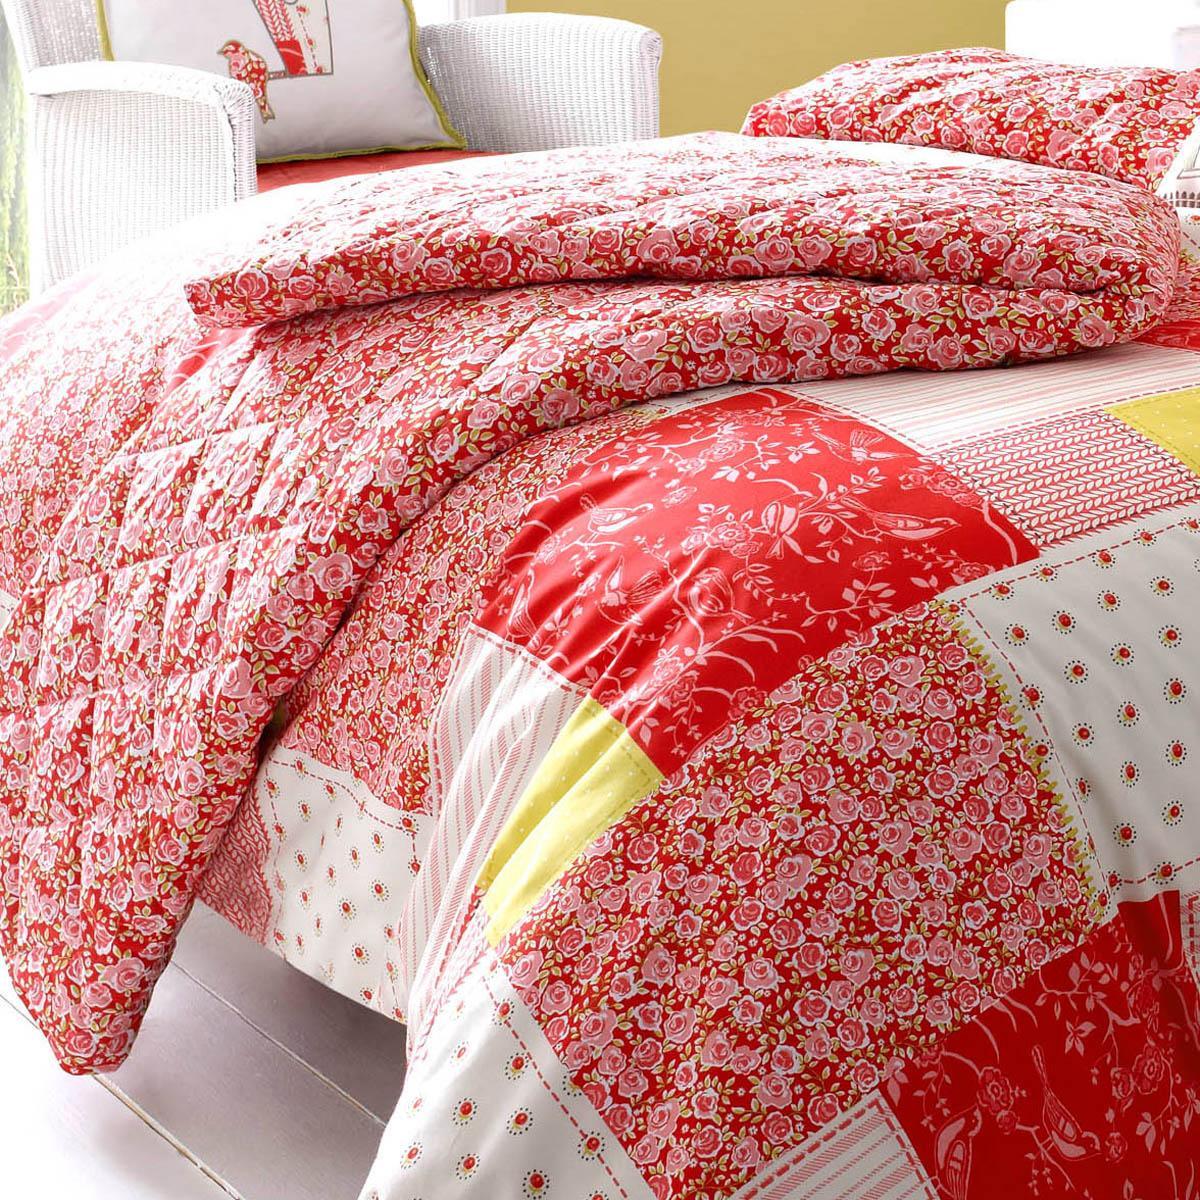 Strawberry Kirstie Allsopp Luella Quilted Bedspread